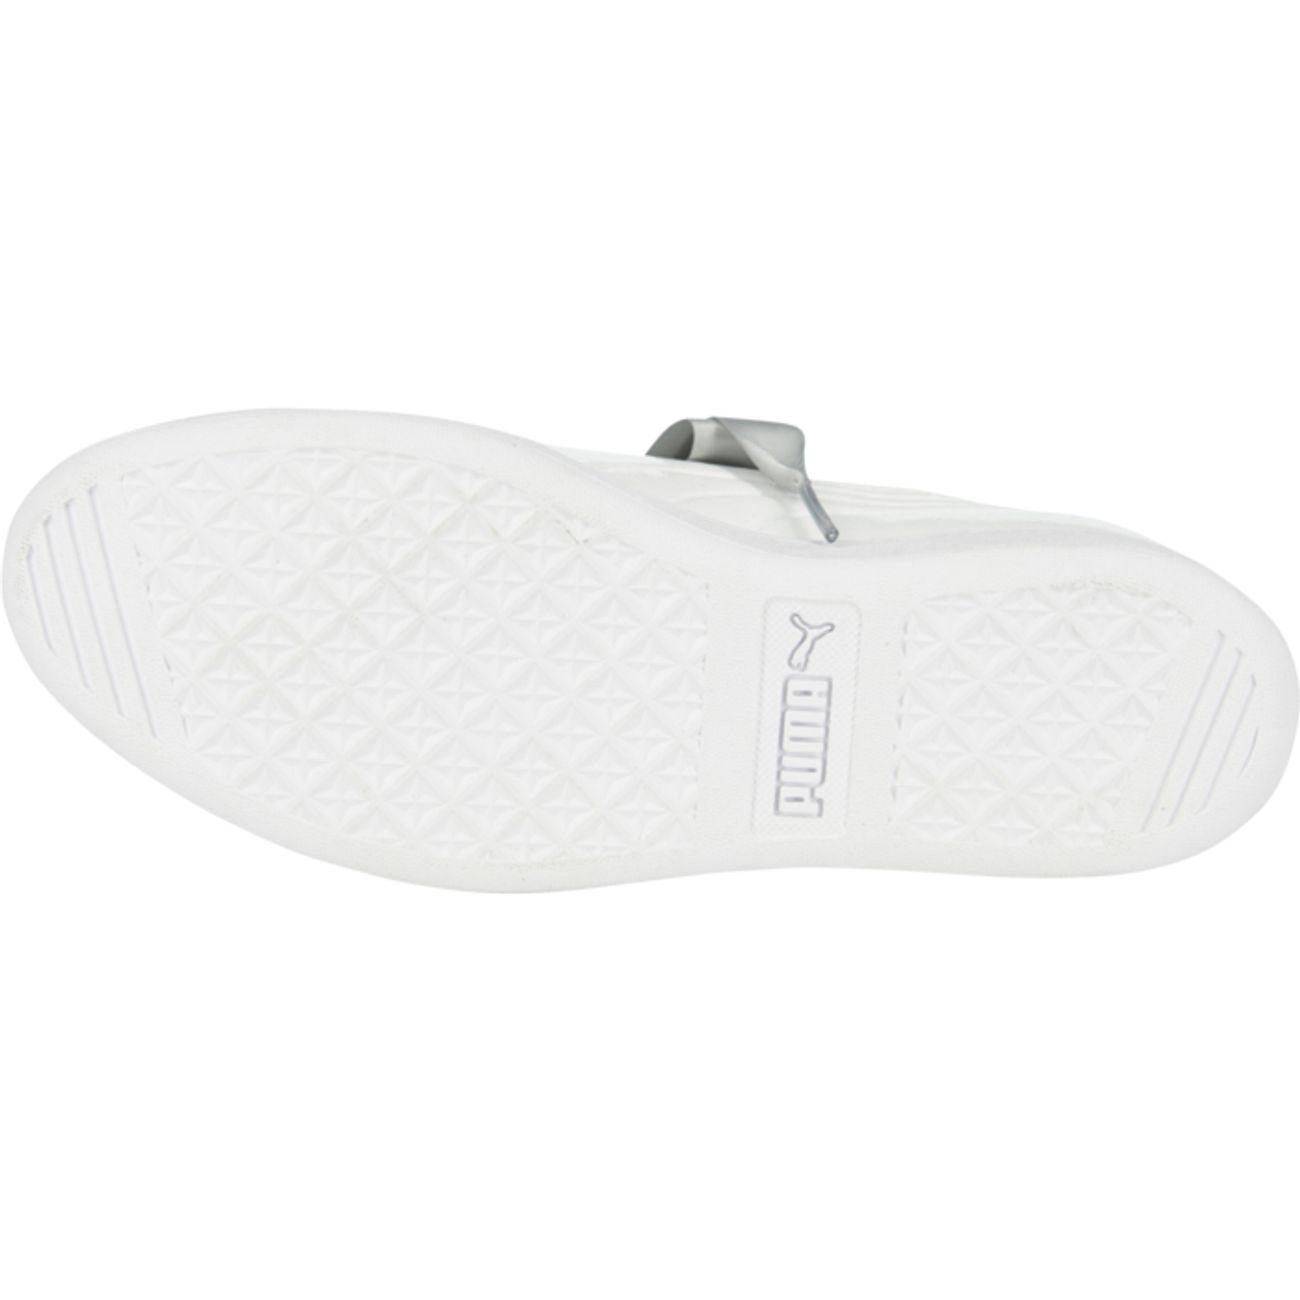 Vikky Bte Femme Chaussures Puma Blanc Patent Basses OkP0wn